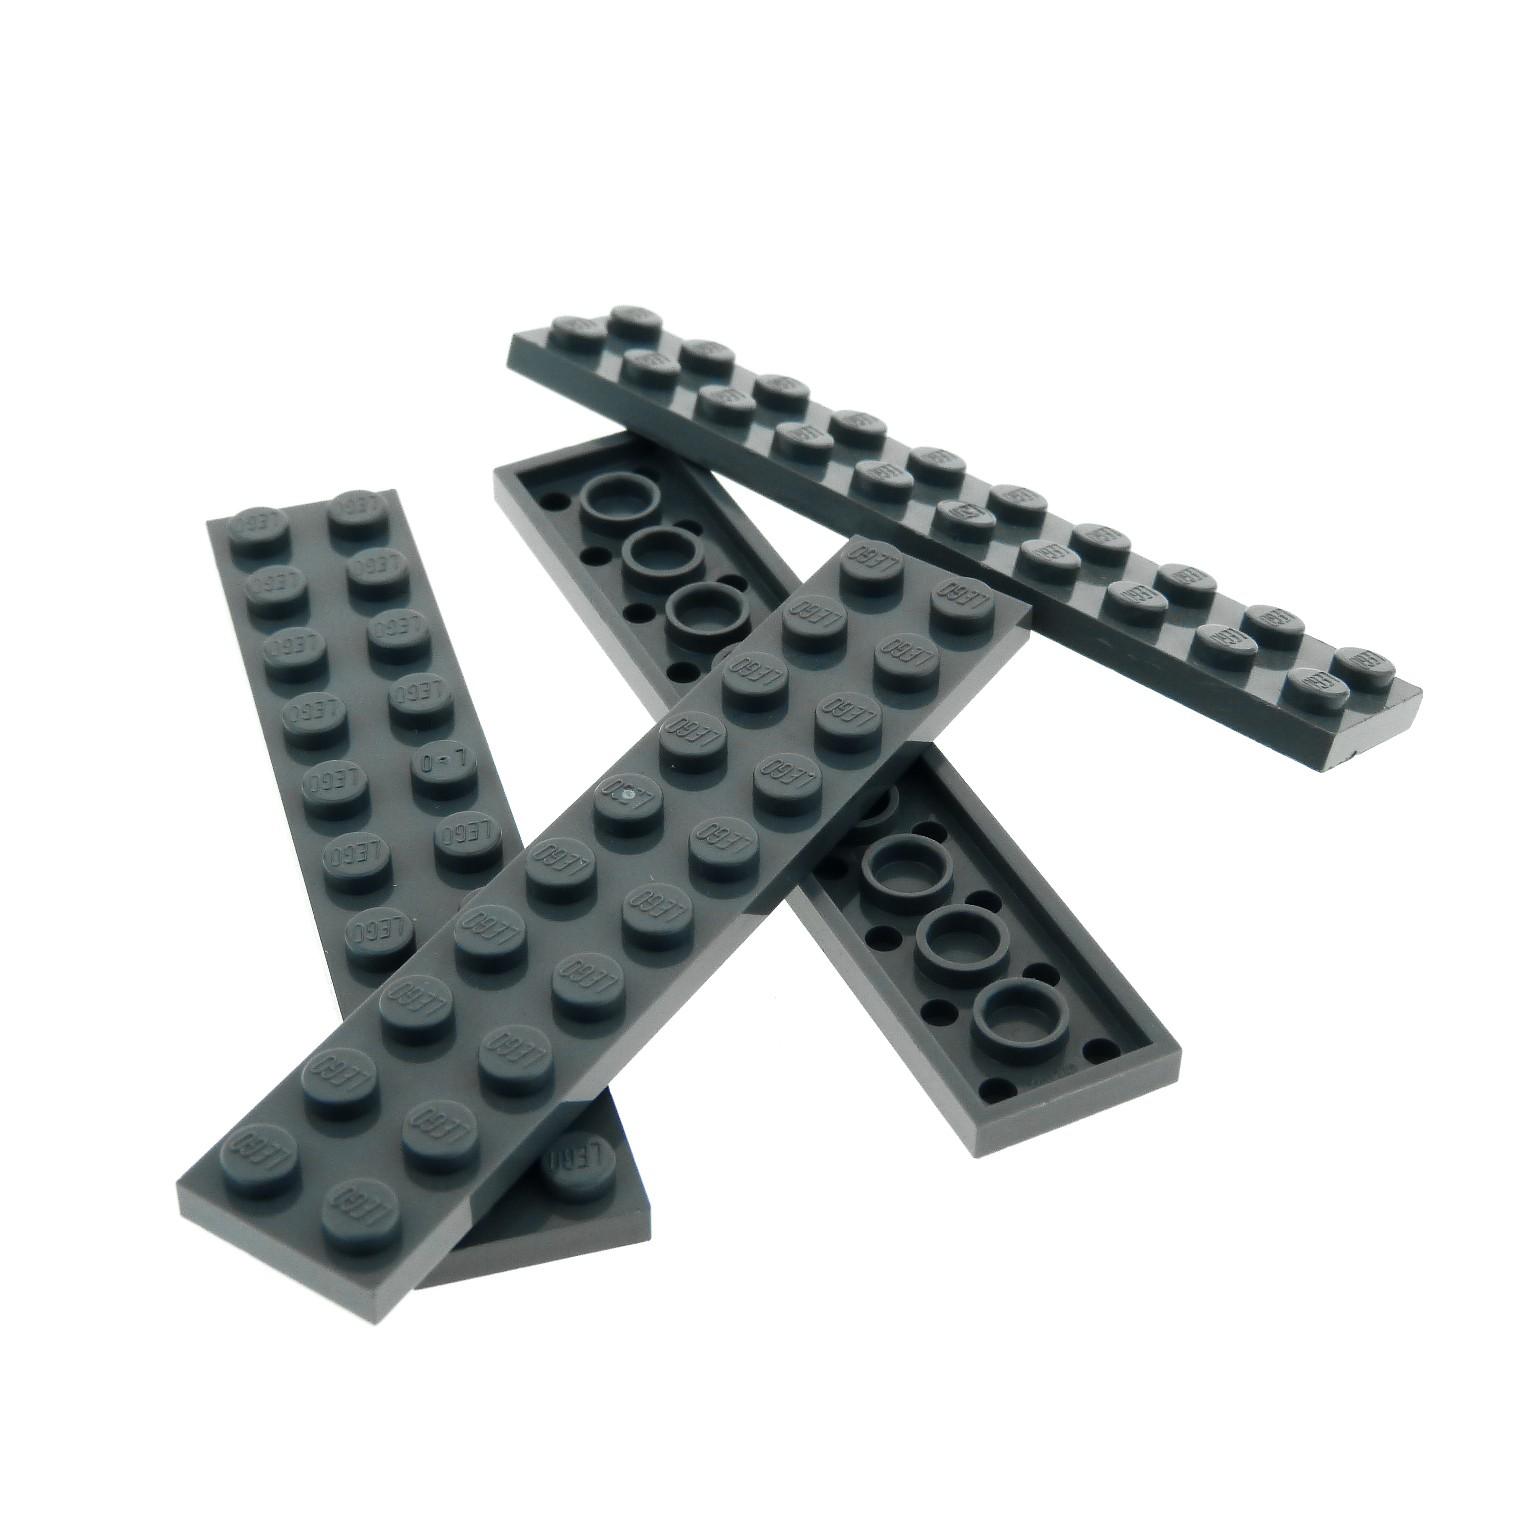 Lego 5 x Platte 3832 neu hellgrau  2x10